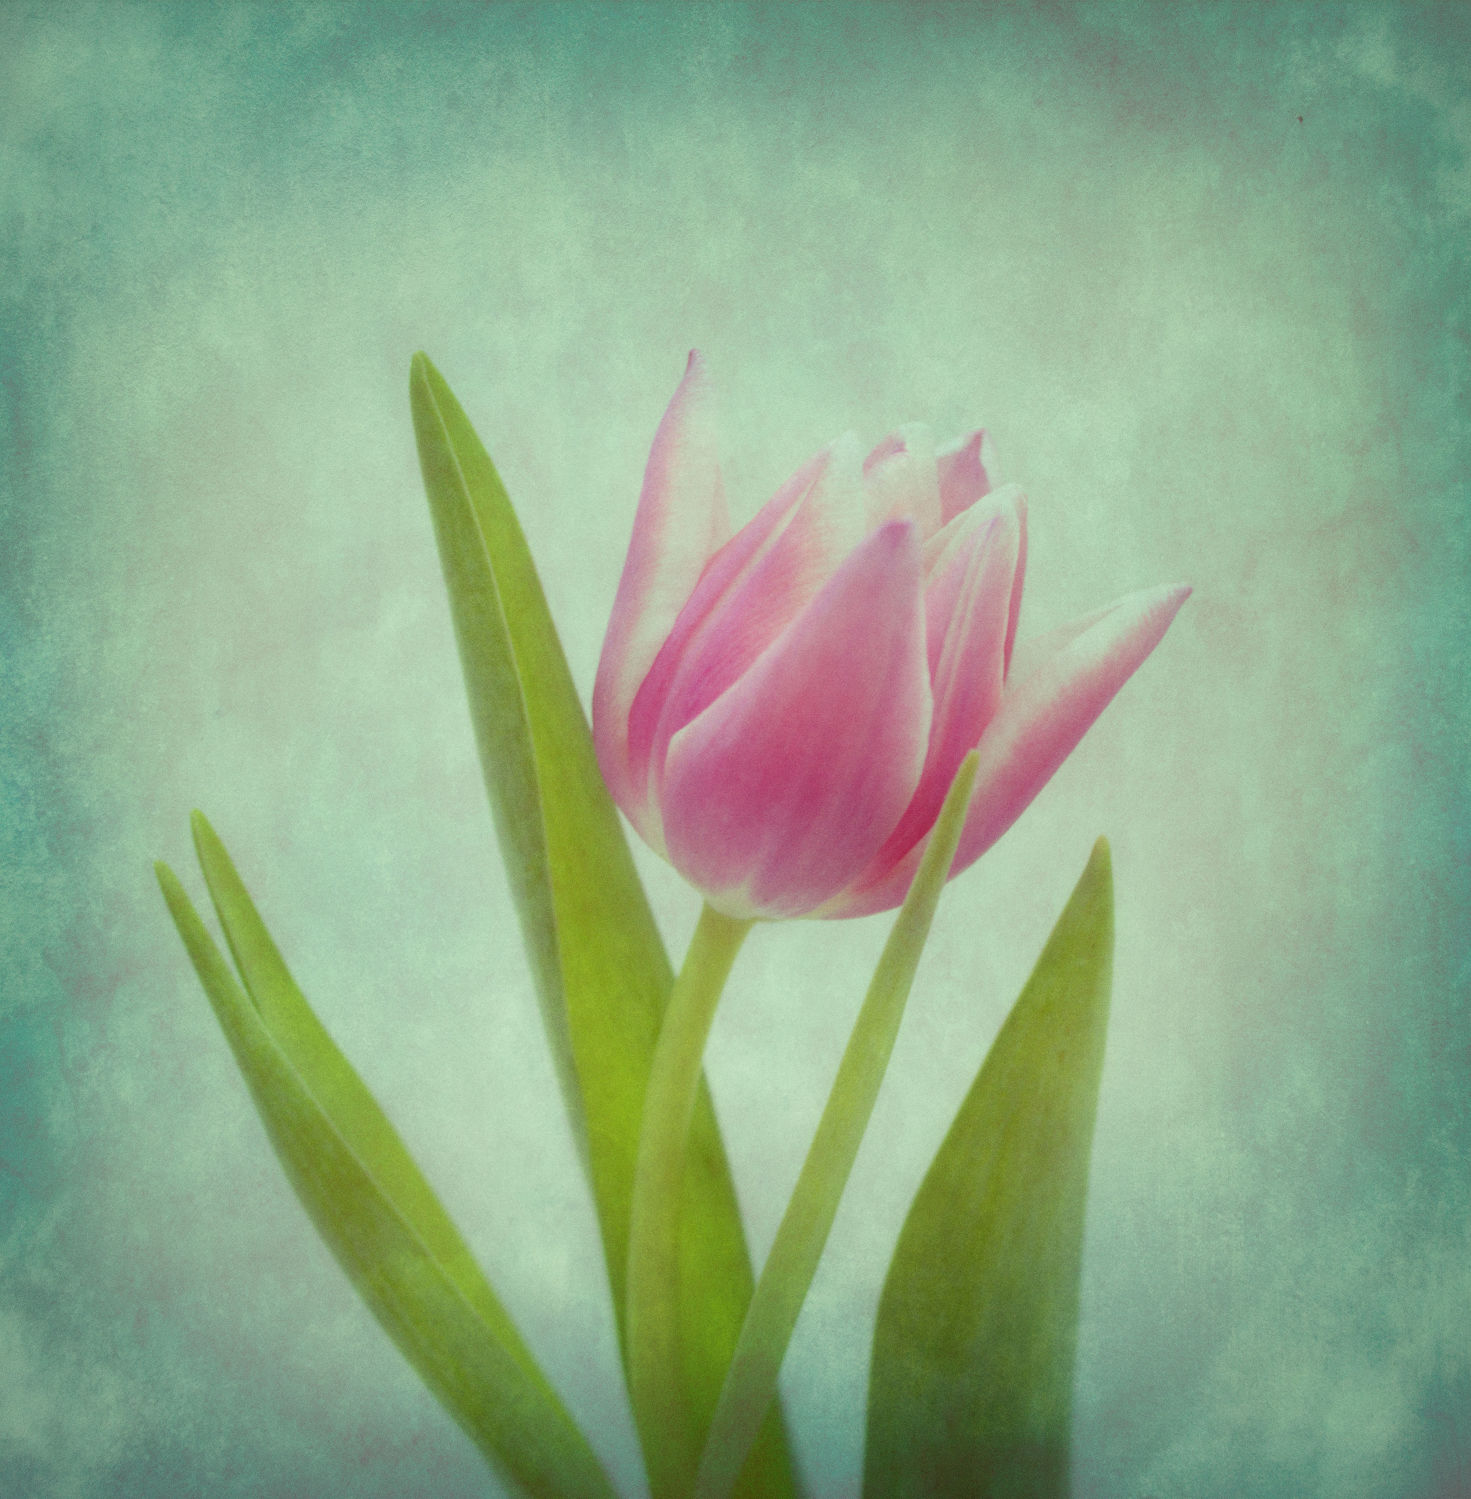 Bild mit Blumen, Tulpe, Tulips